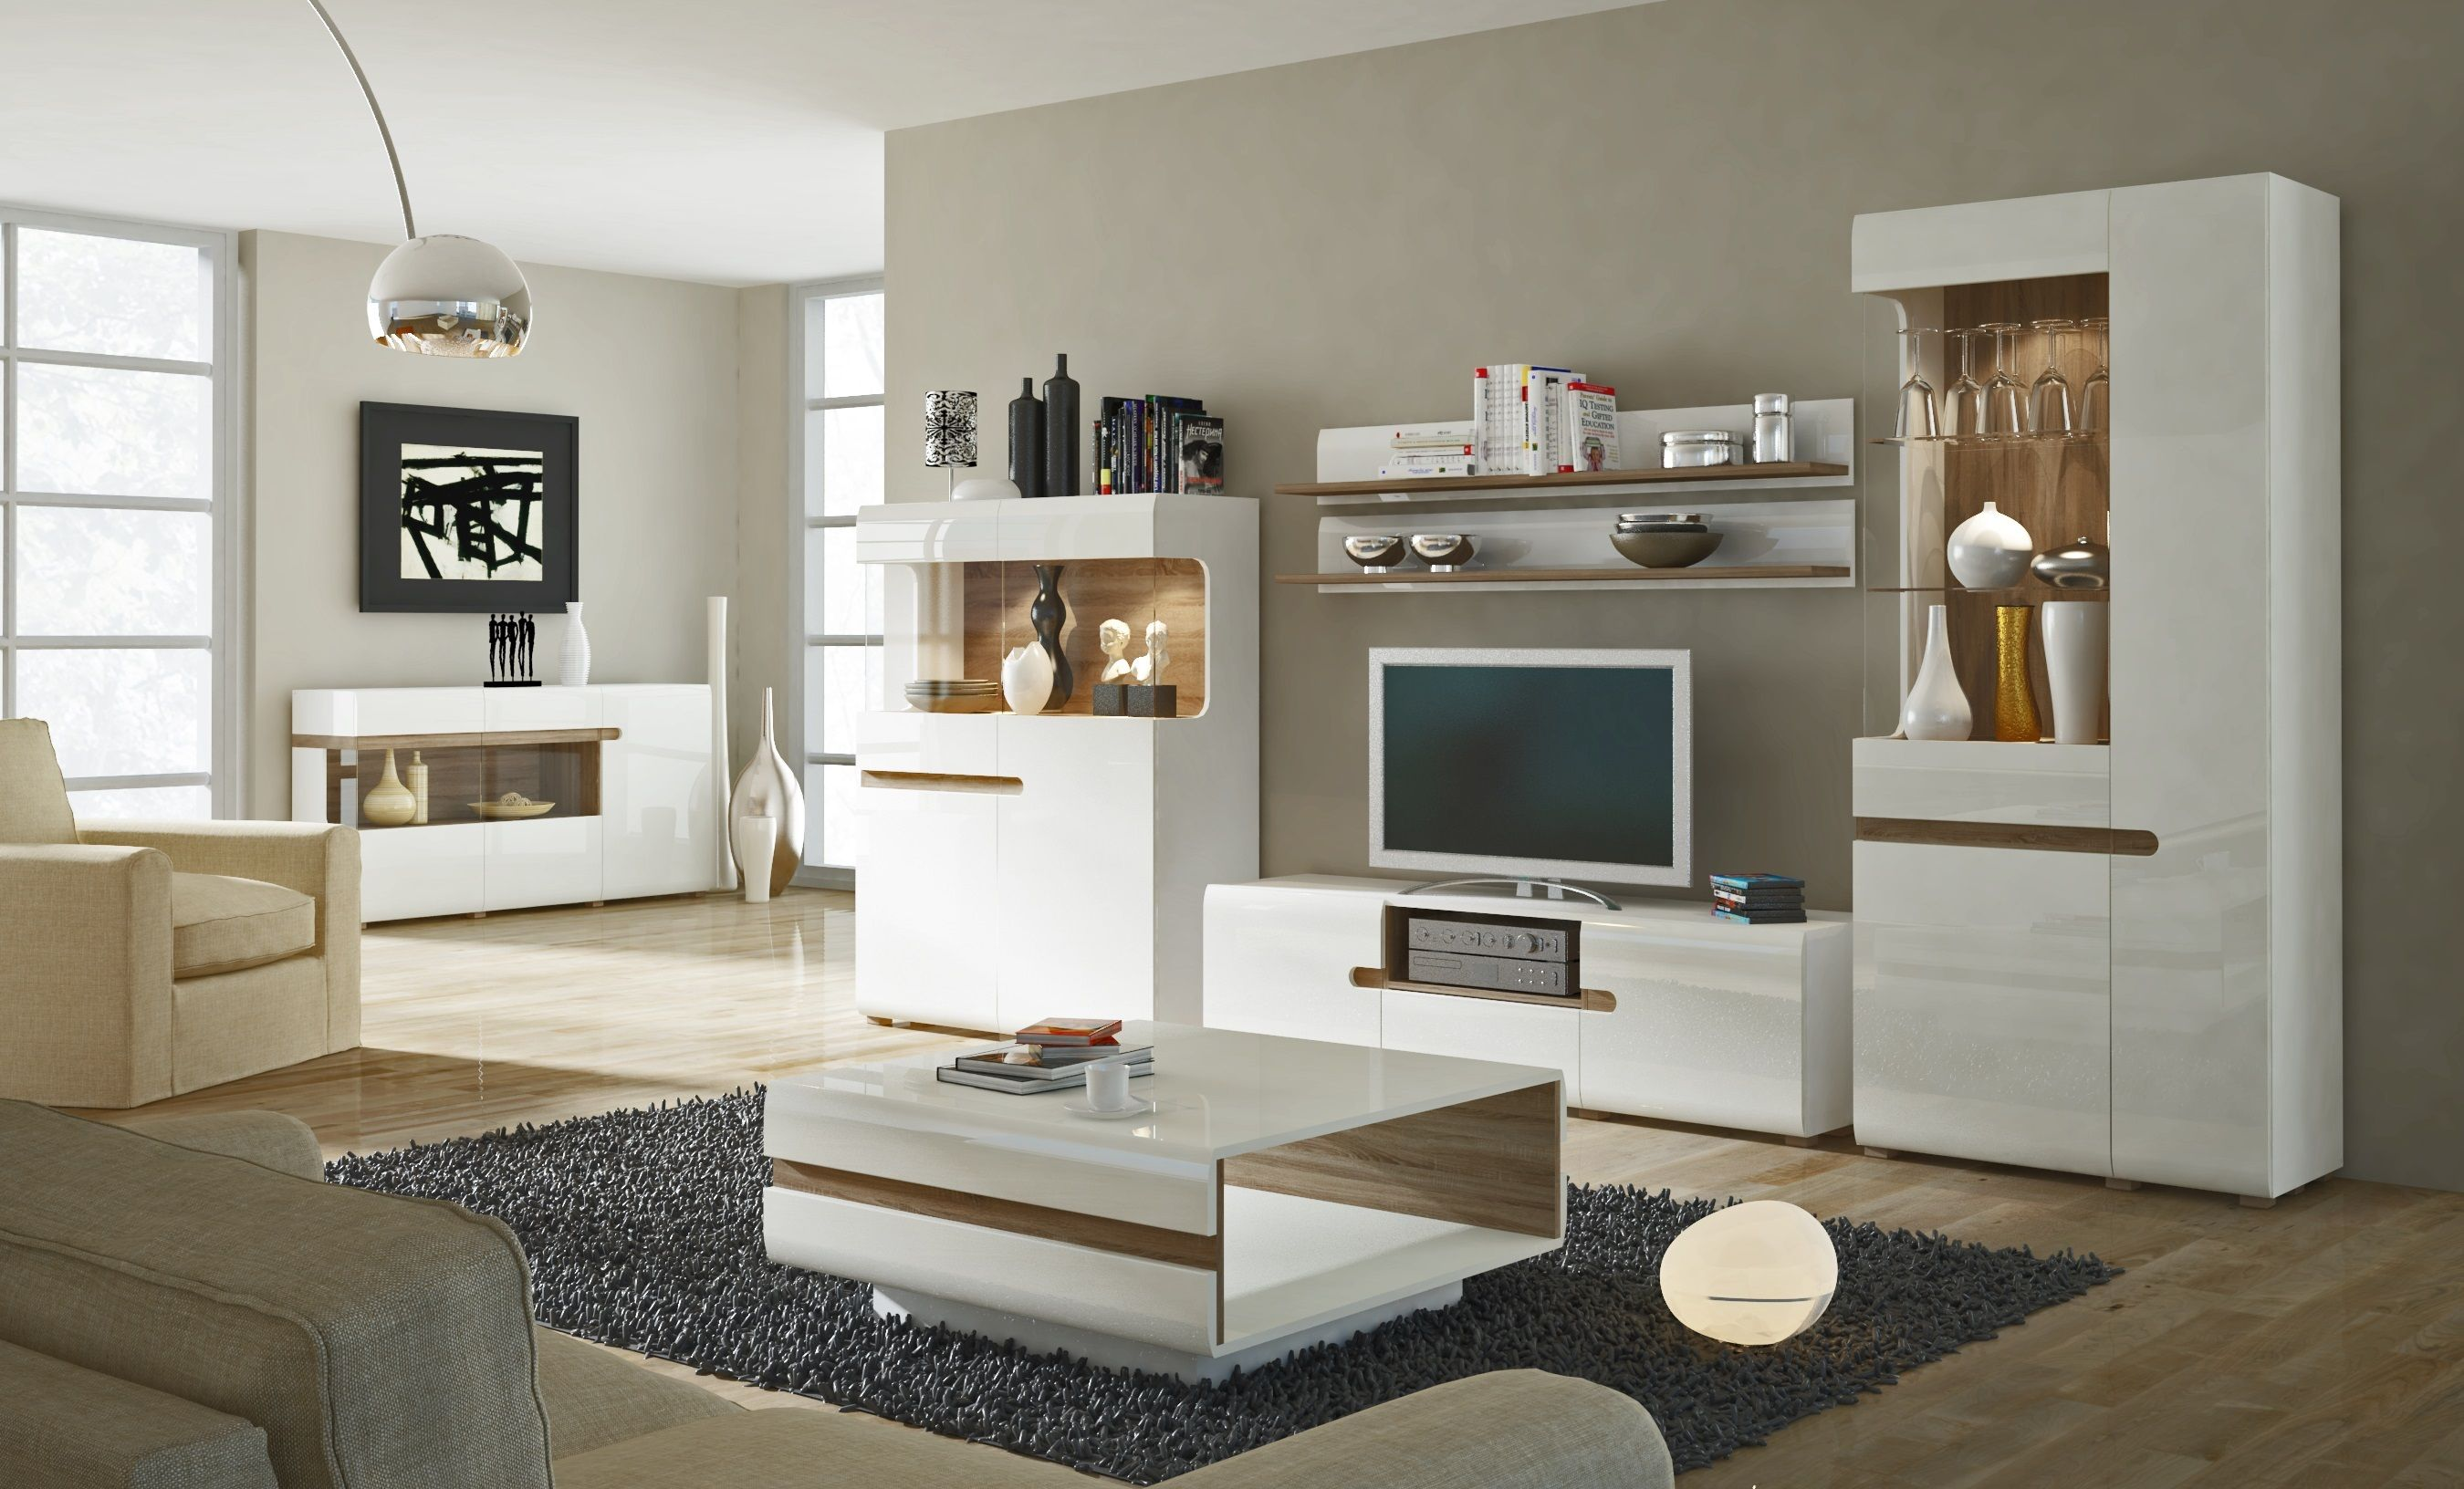 Goedkope Design Meubels.Linate 2 Tv Wandmeubels Woonkamerkasten Moderne Meubels En Tv